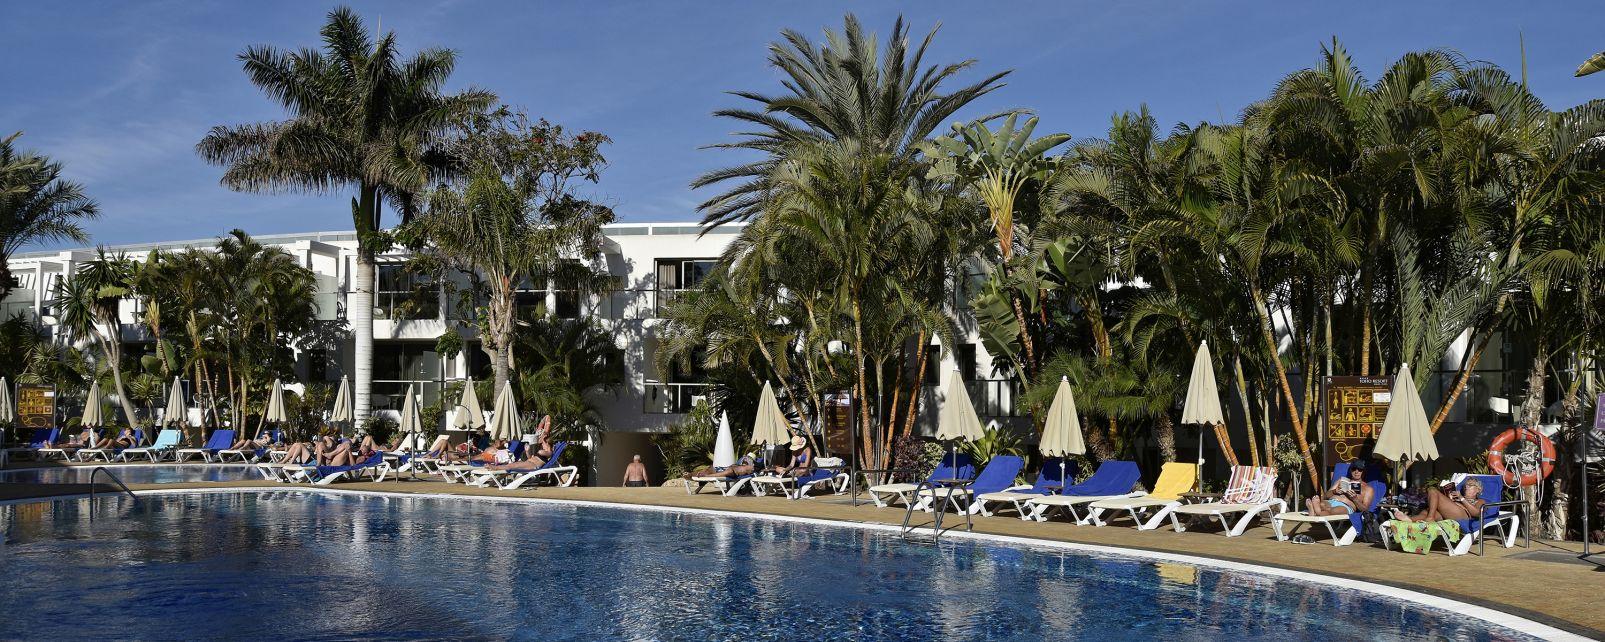 H tel club r2 bahia playa tarajalejo espagne for Hotel design r2 bahia playa 4 fuerteventura